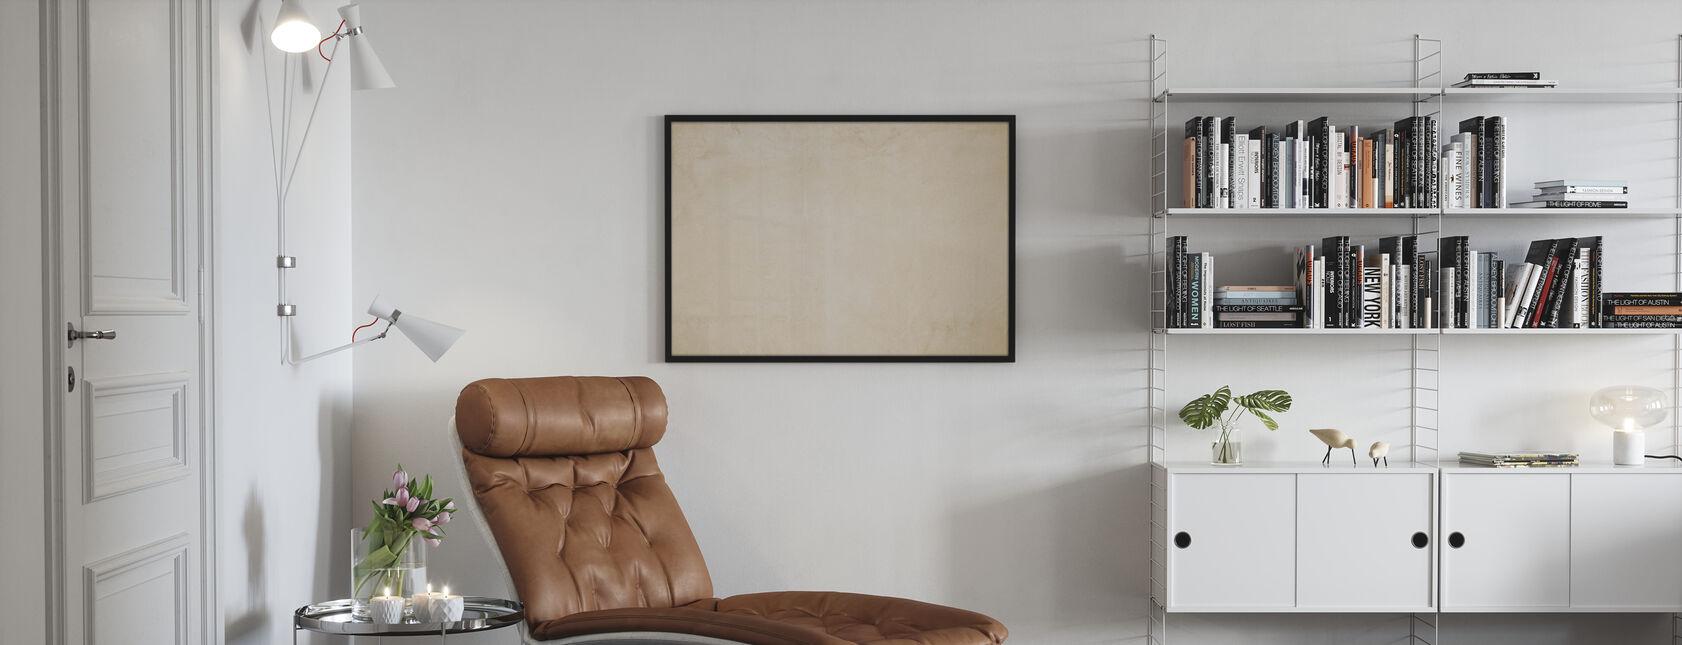 Cream Betonde muur - Poster - Woonkamer